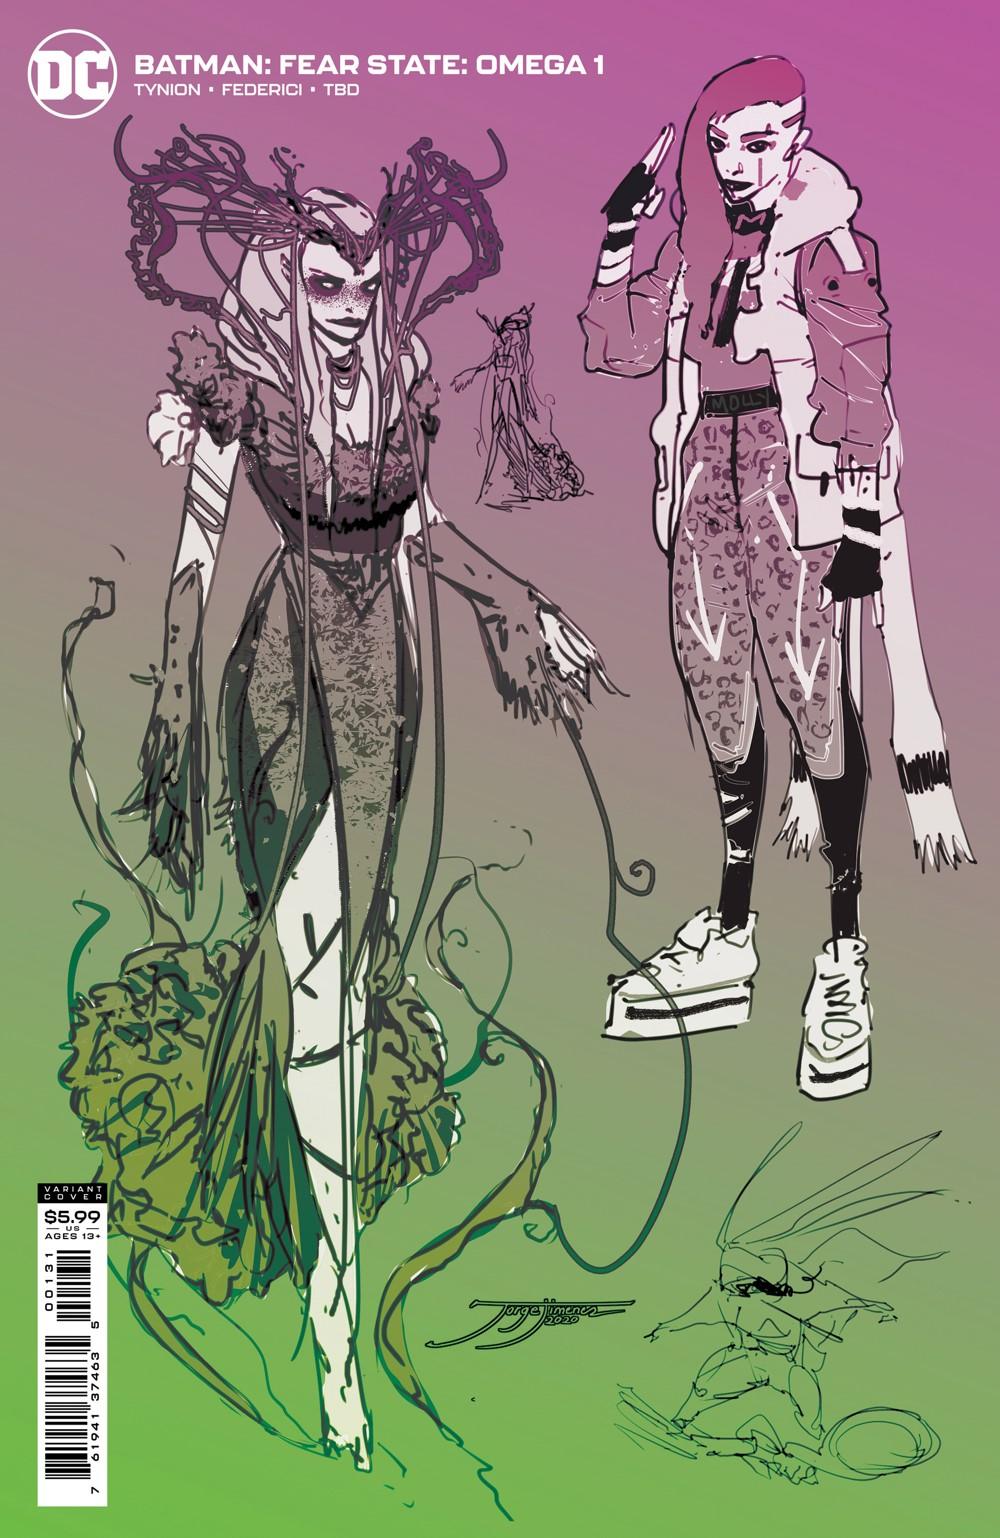 BM_FS_OMEGA_Cv1_1in25_var_00131 DC Comics November 2021 Solicitations